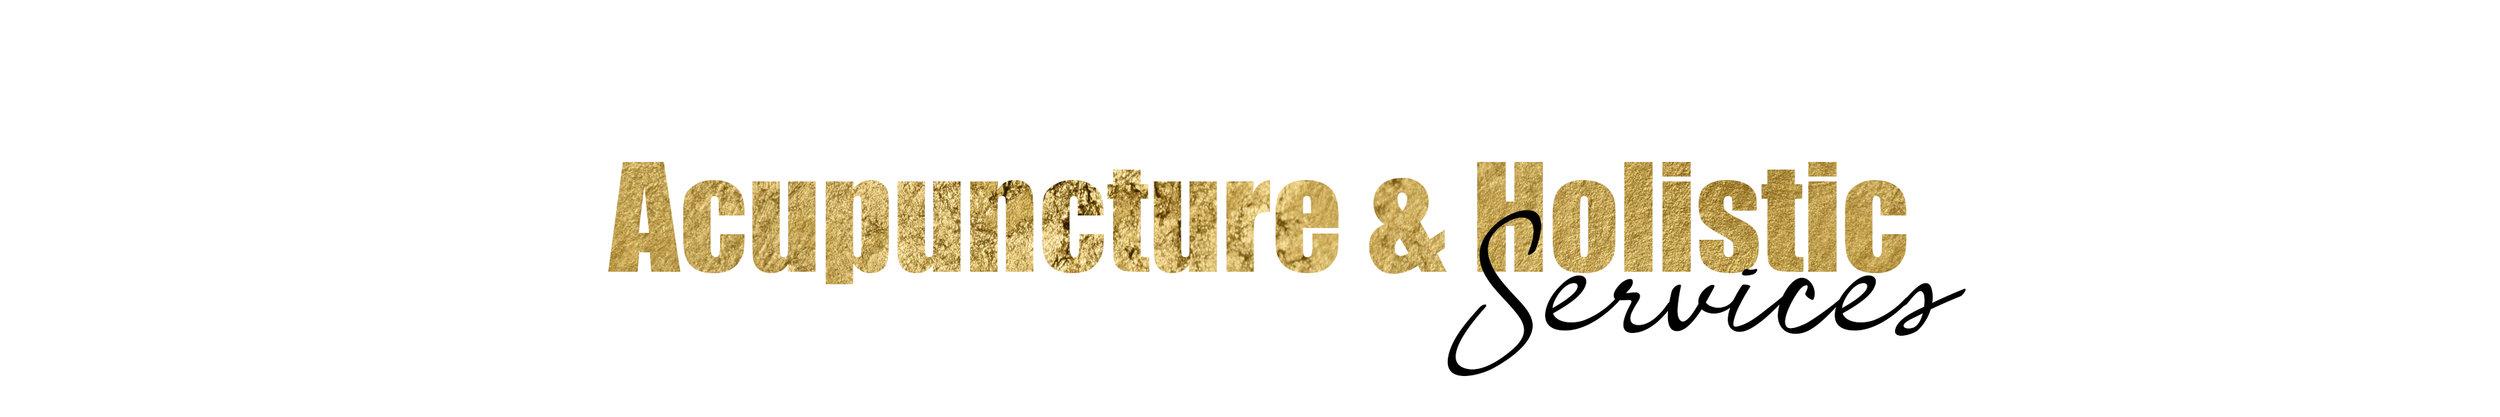 bannerAcupunctureServices.jpg